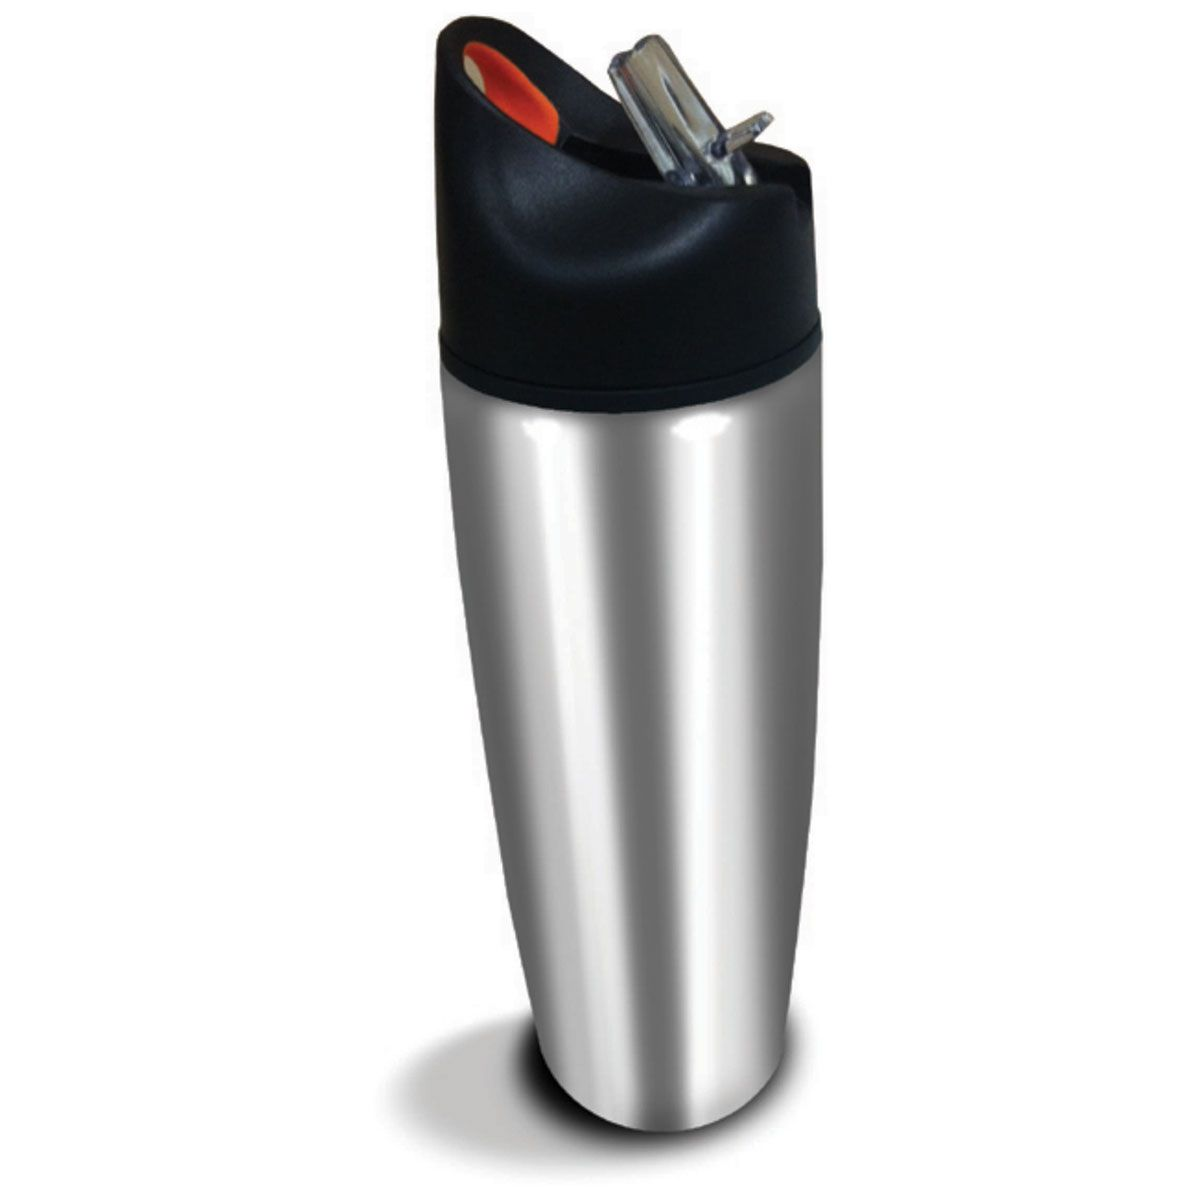 Garrafa Squeeze Em Aço Prata 900ml - Acte - C16